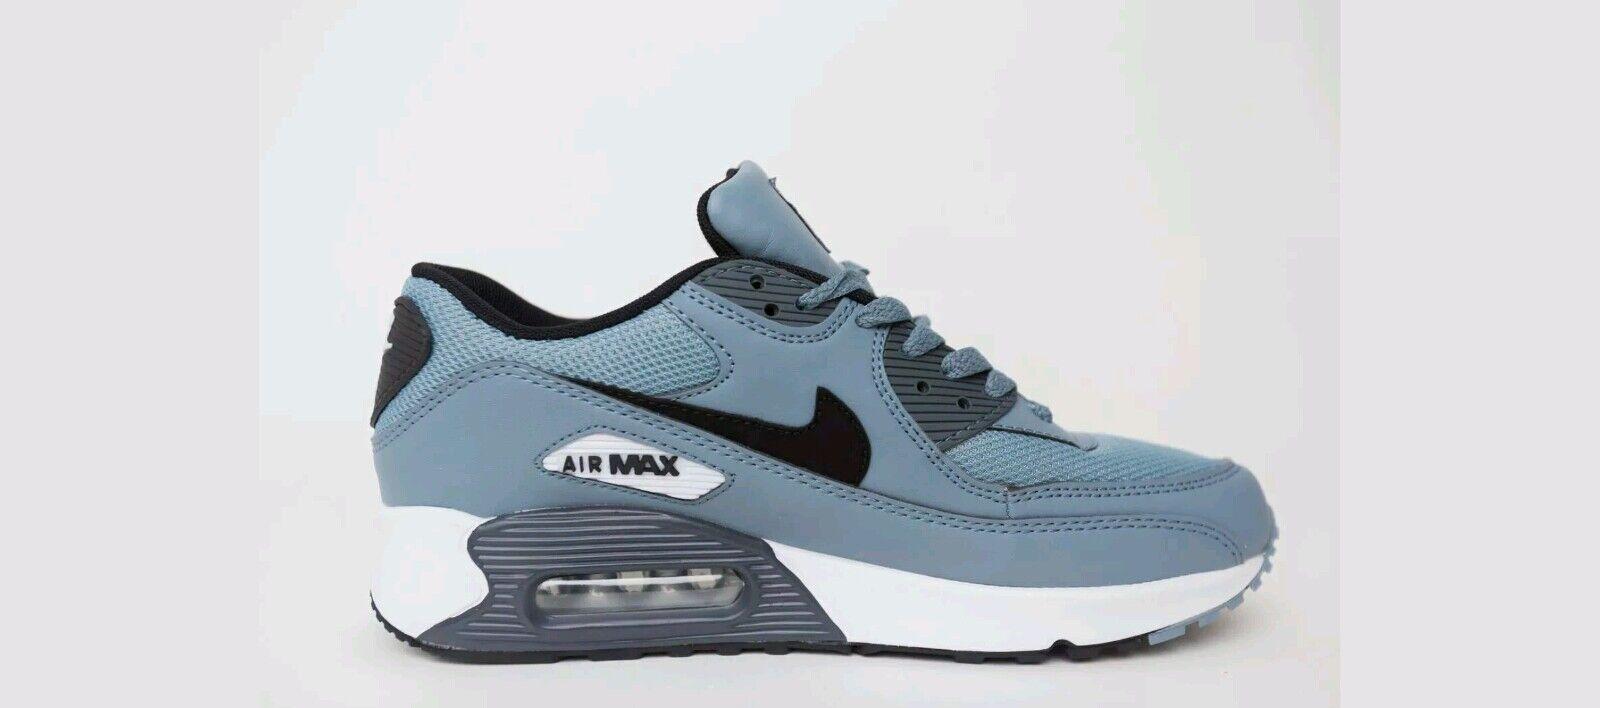 Nike Air Max 90 Schuhe Schuhe 90 Sneaker d5931c